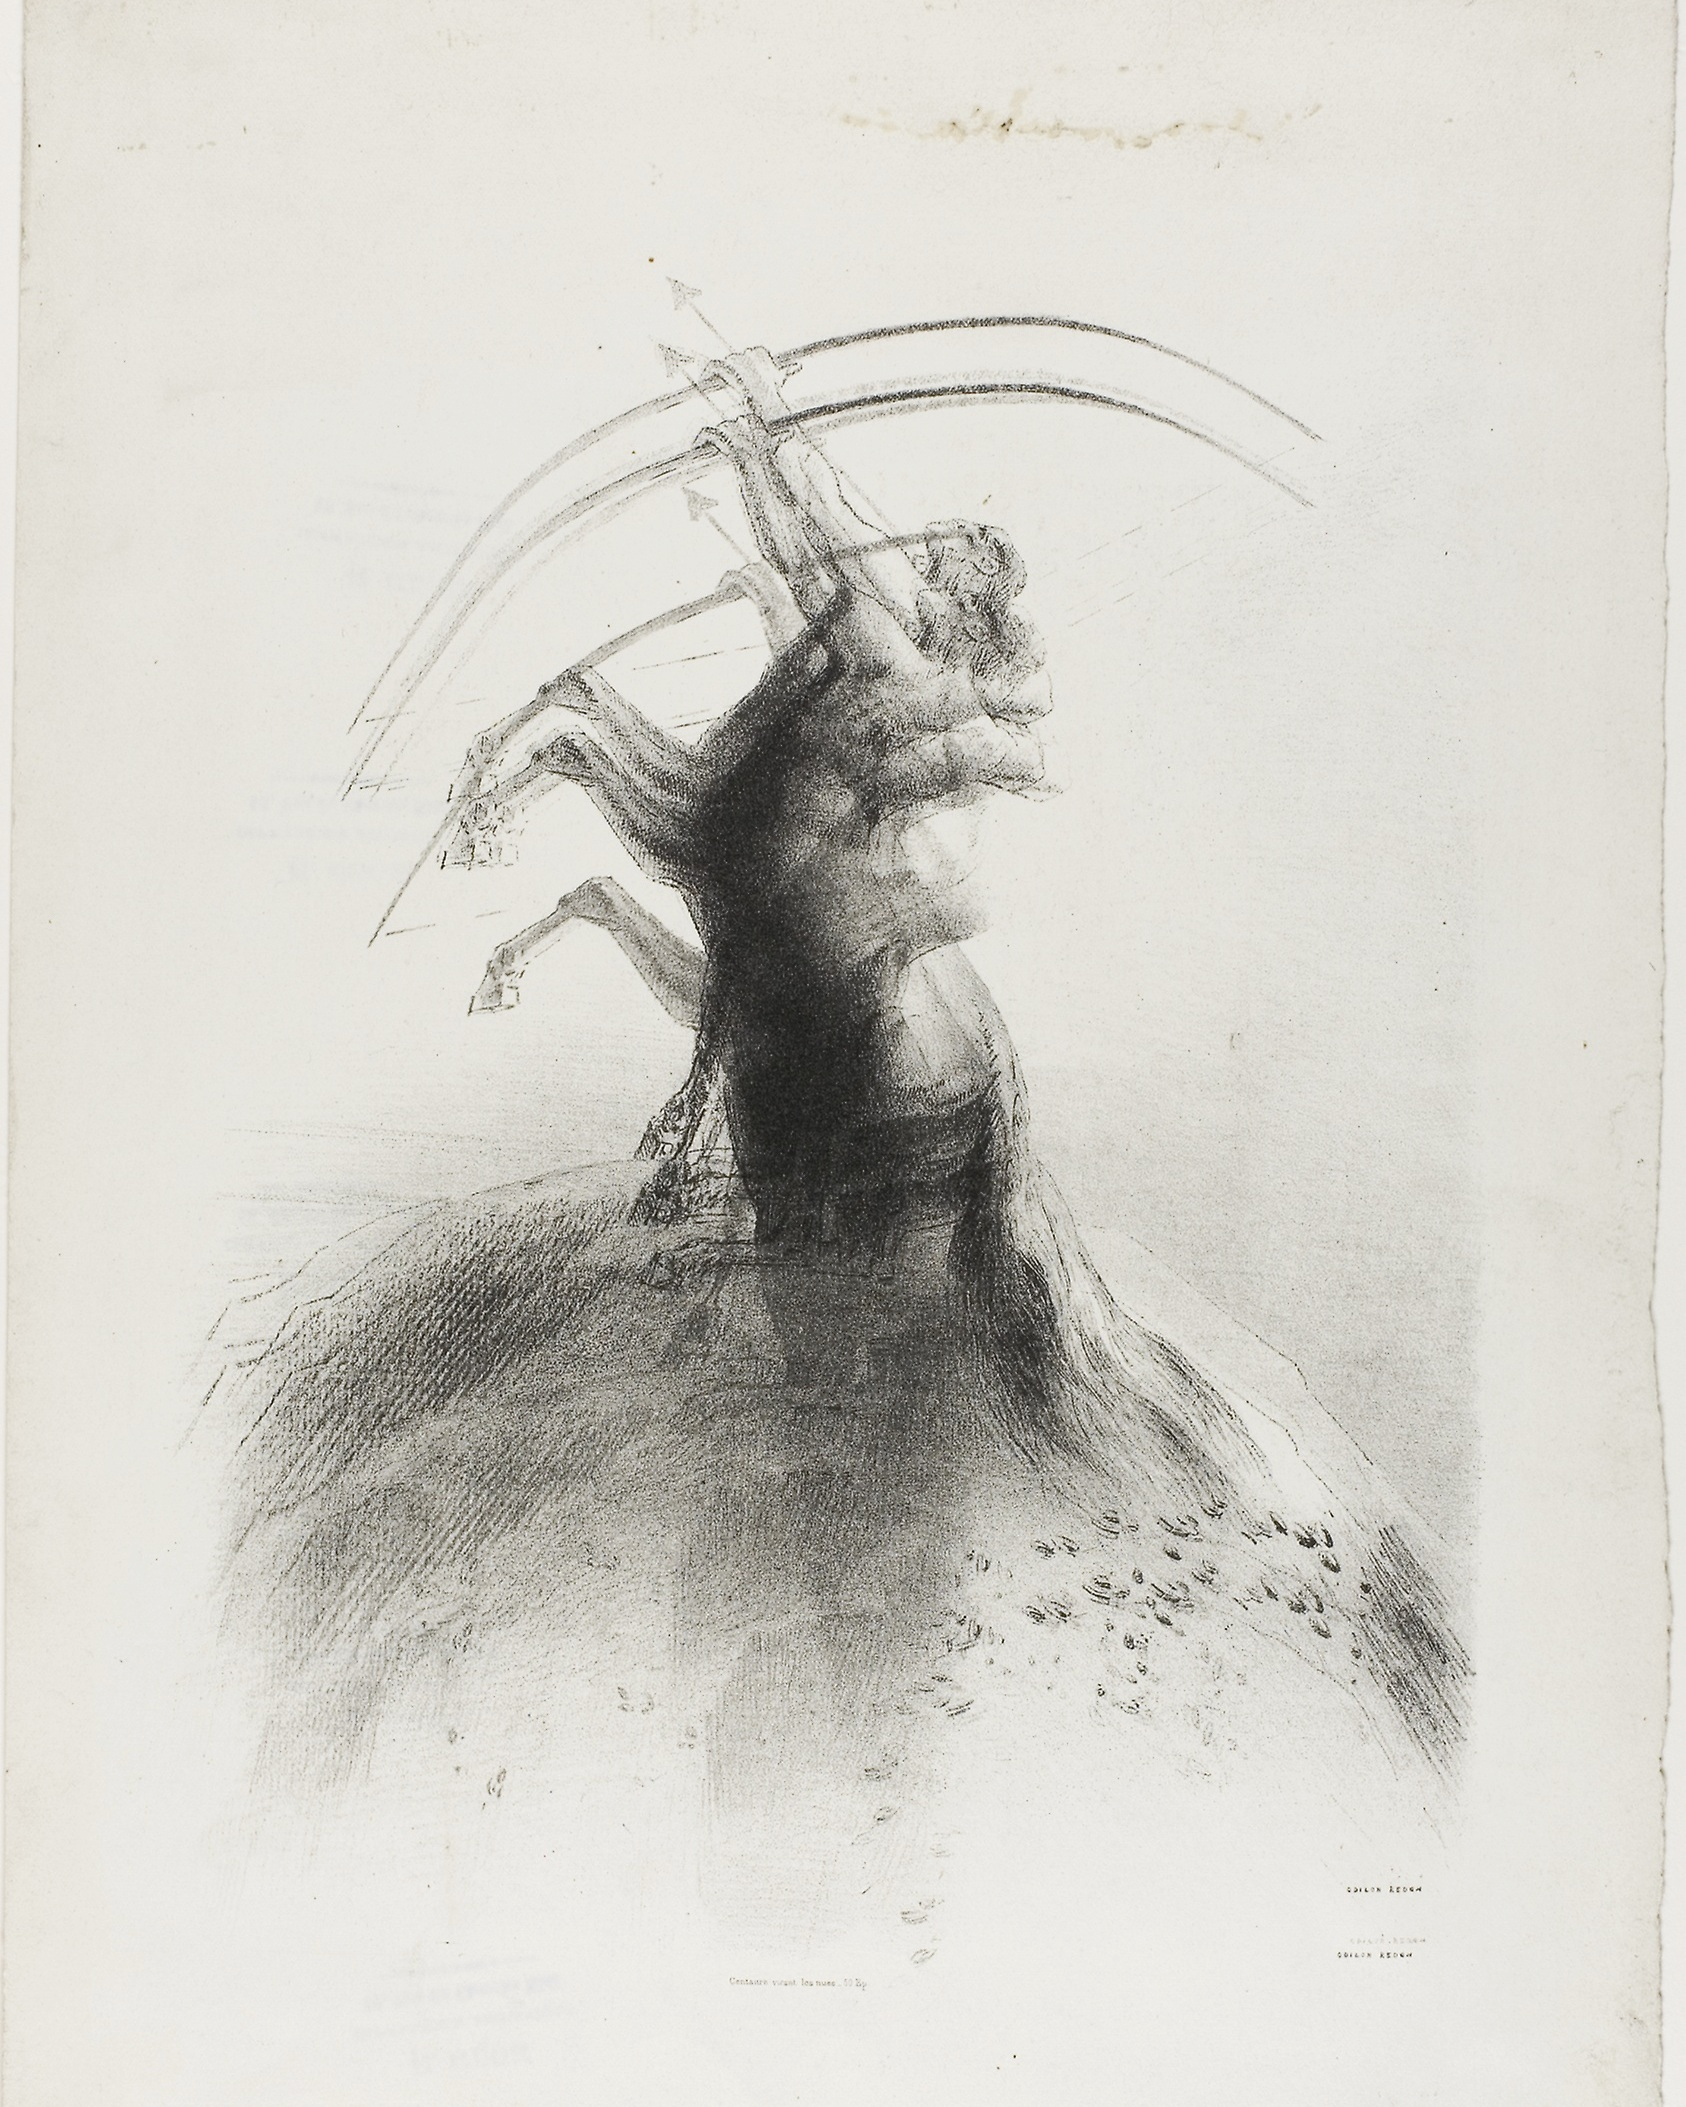 Odilon Redon, Centaur Taking Aim at the Clouds, 1895, AIC